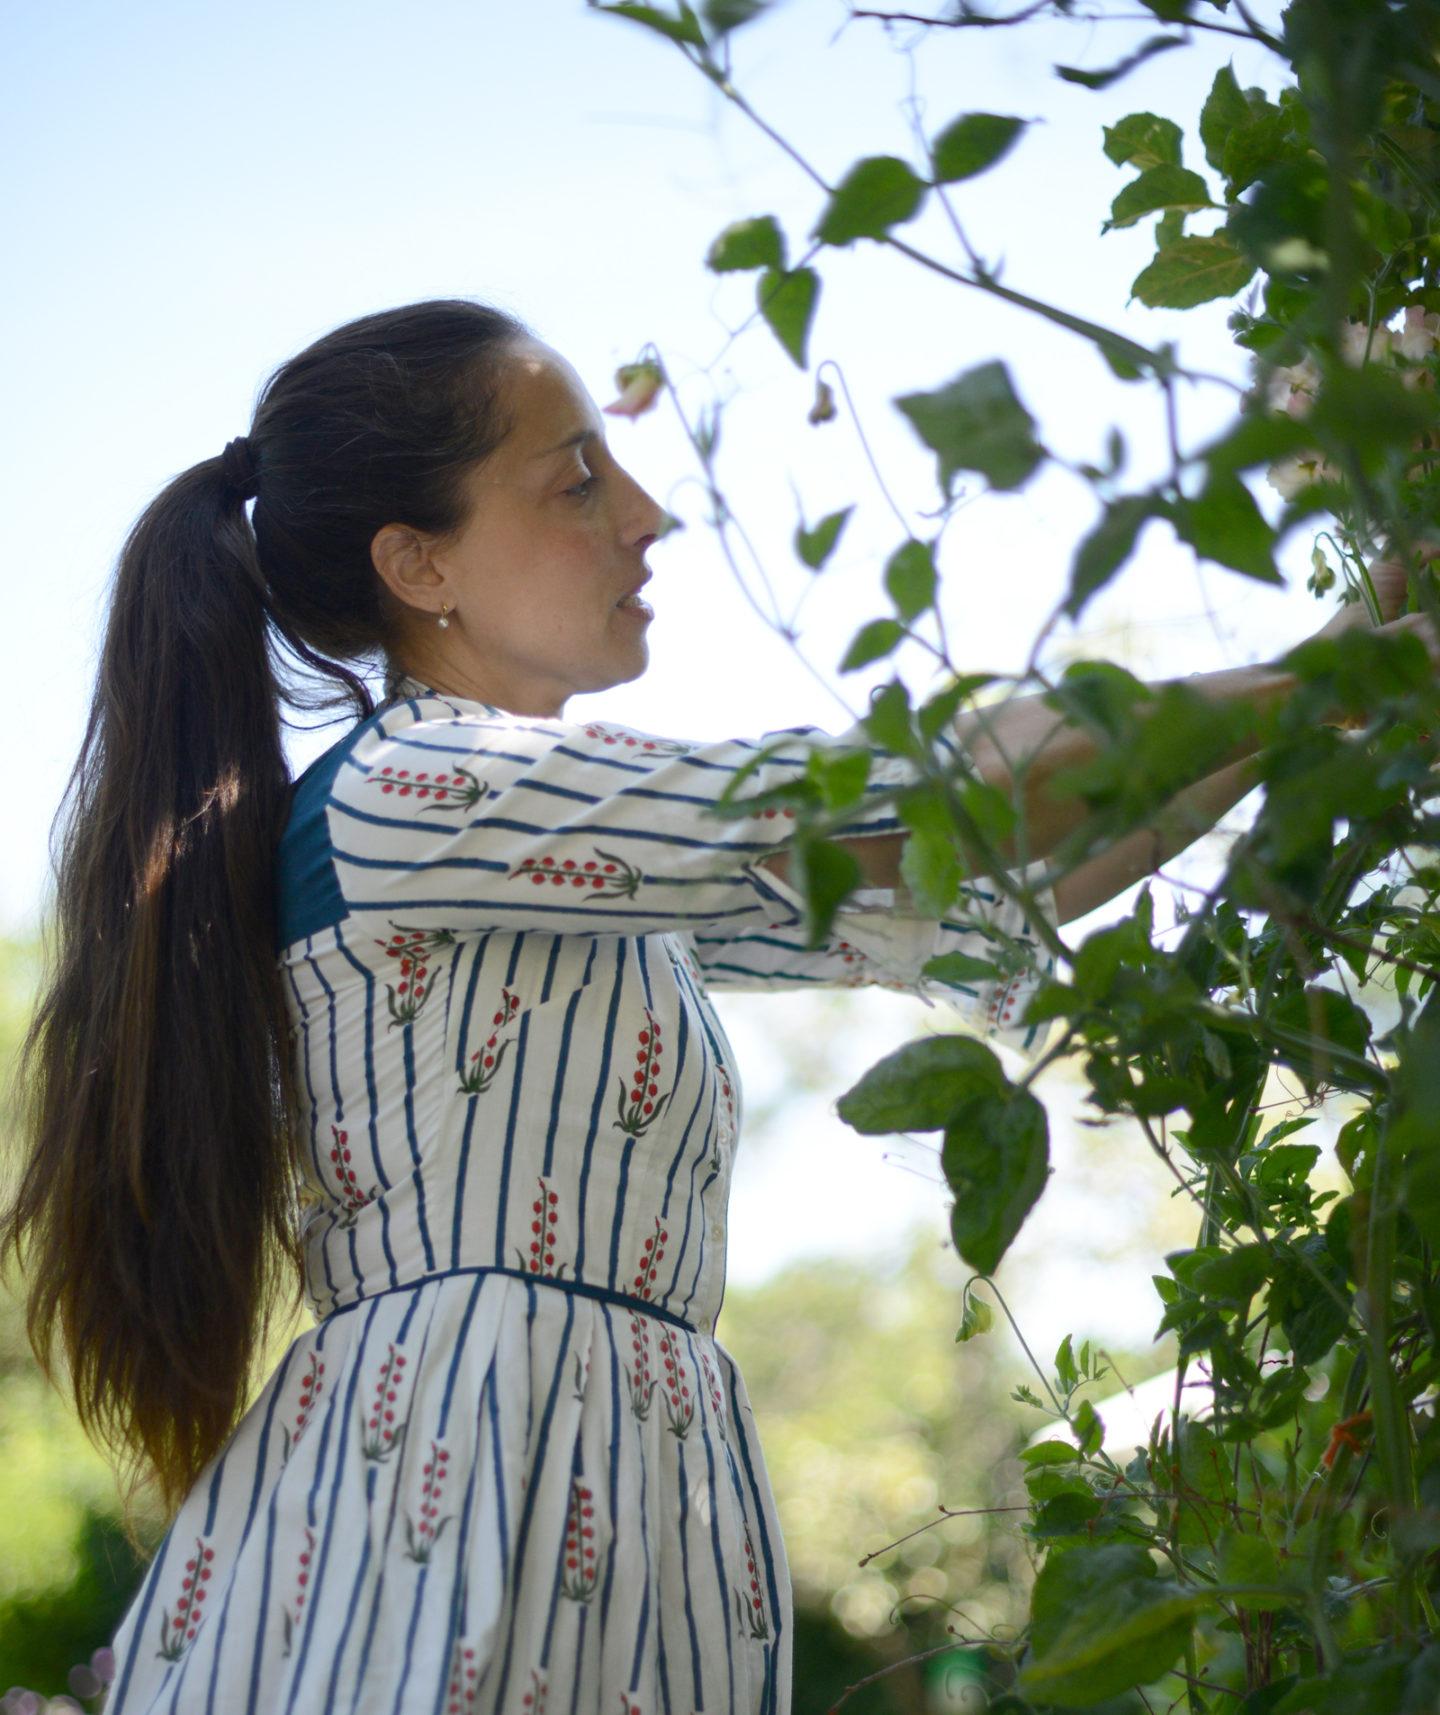 5-january-gardening-tips-notesfromastylist